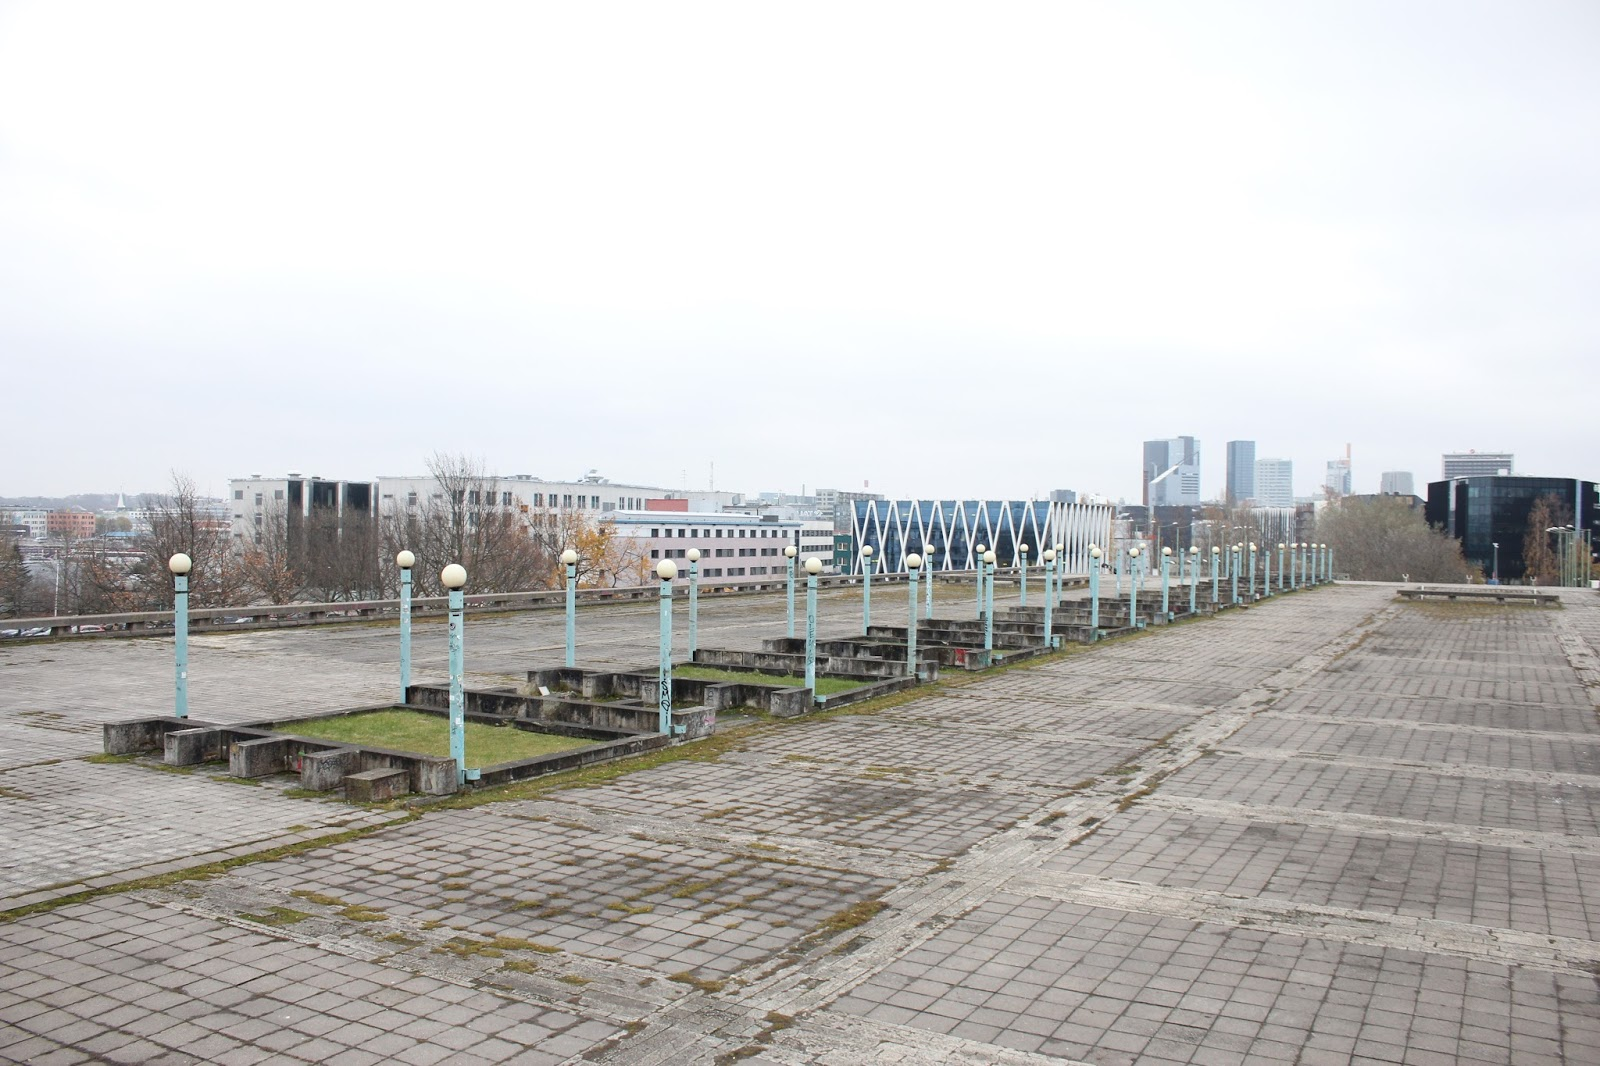 Exploring an Abandoned Olympic Stadium in Tallinn, Estonia